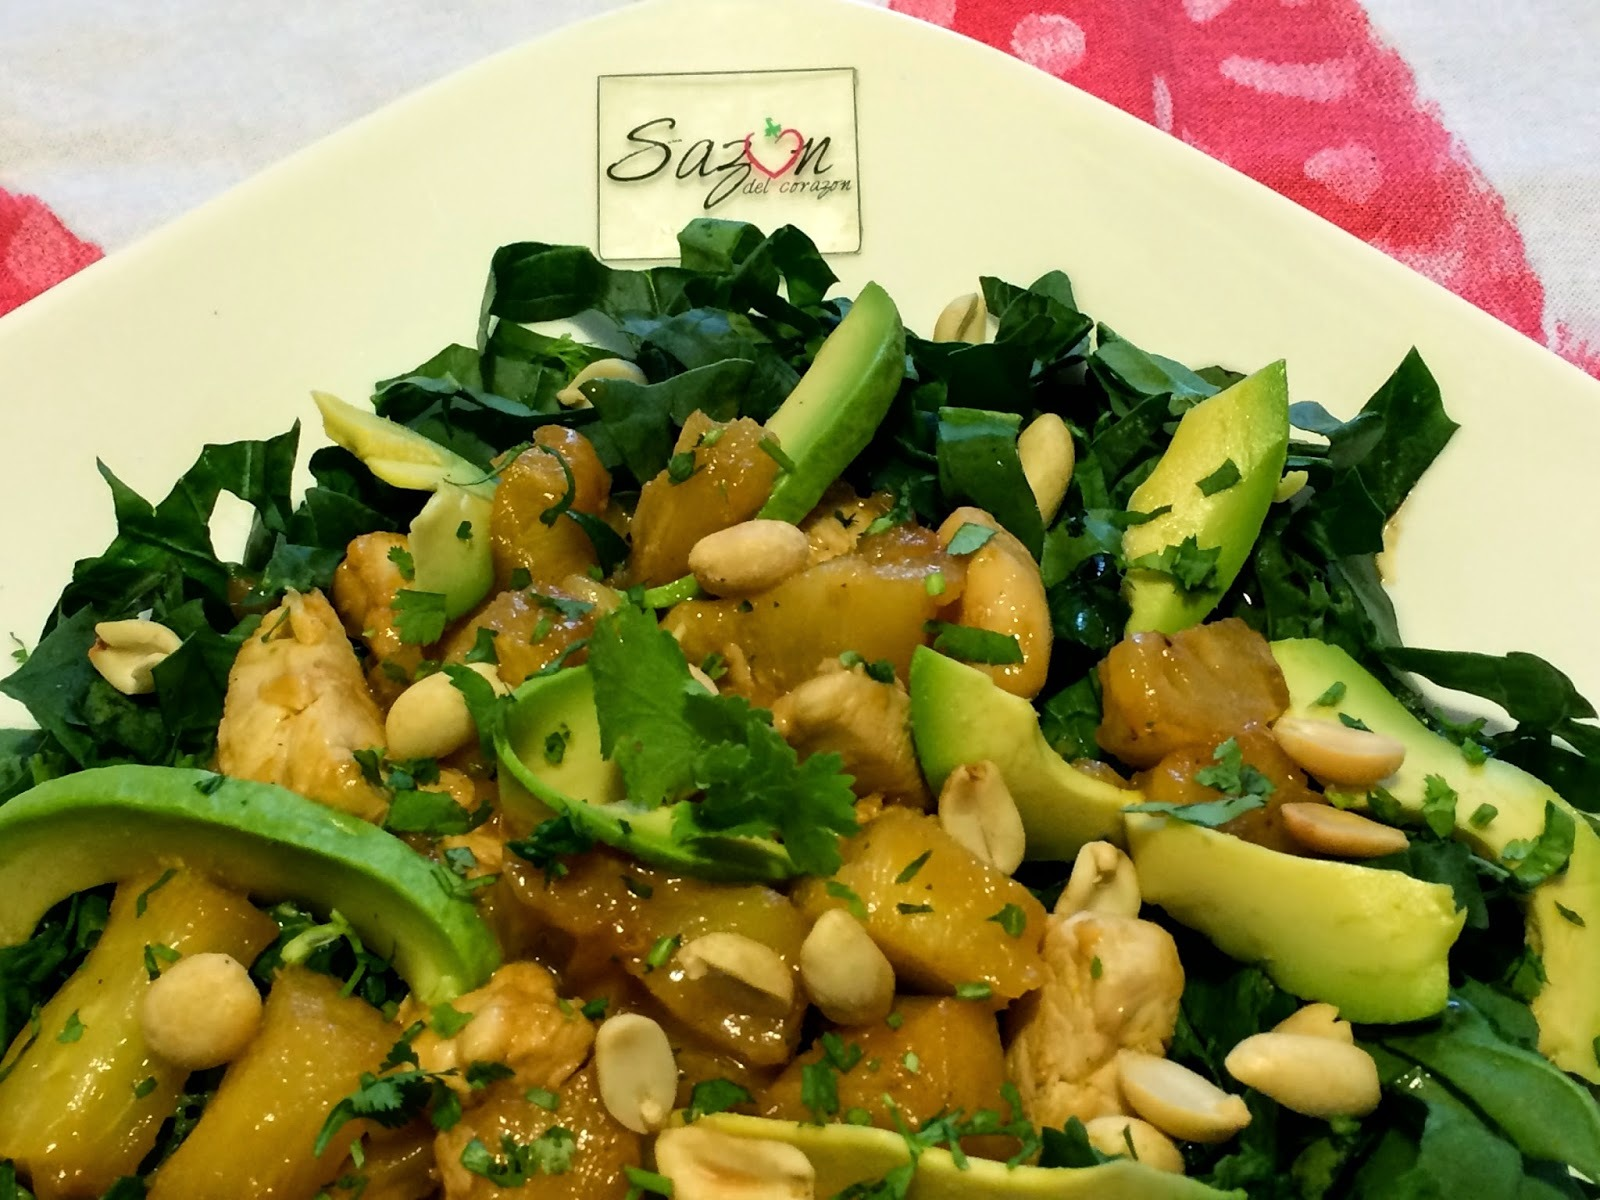 Ensalada de espinacas con pollo y piña